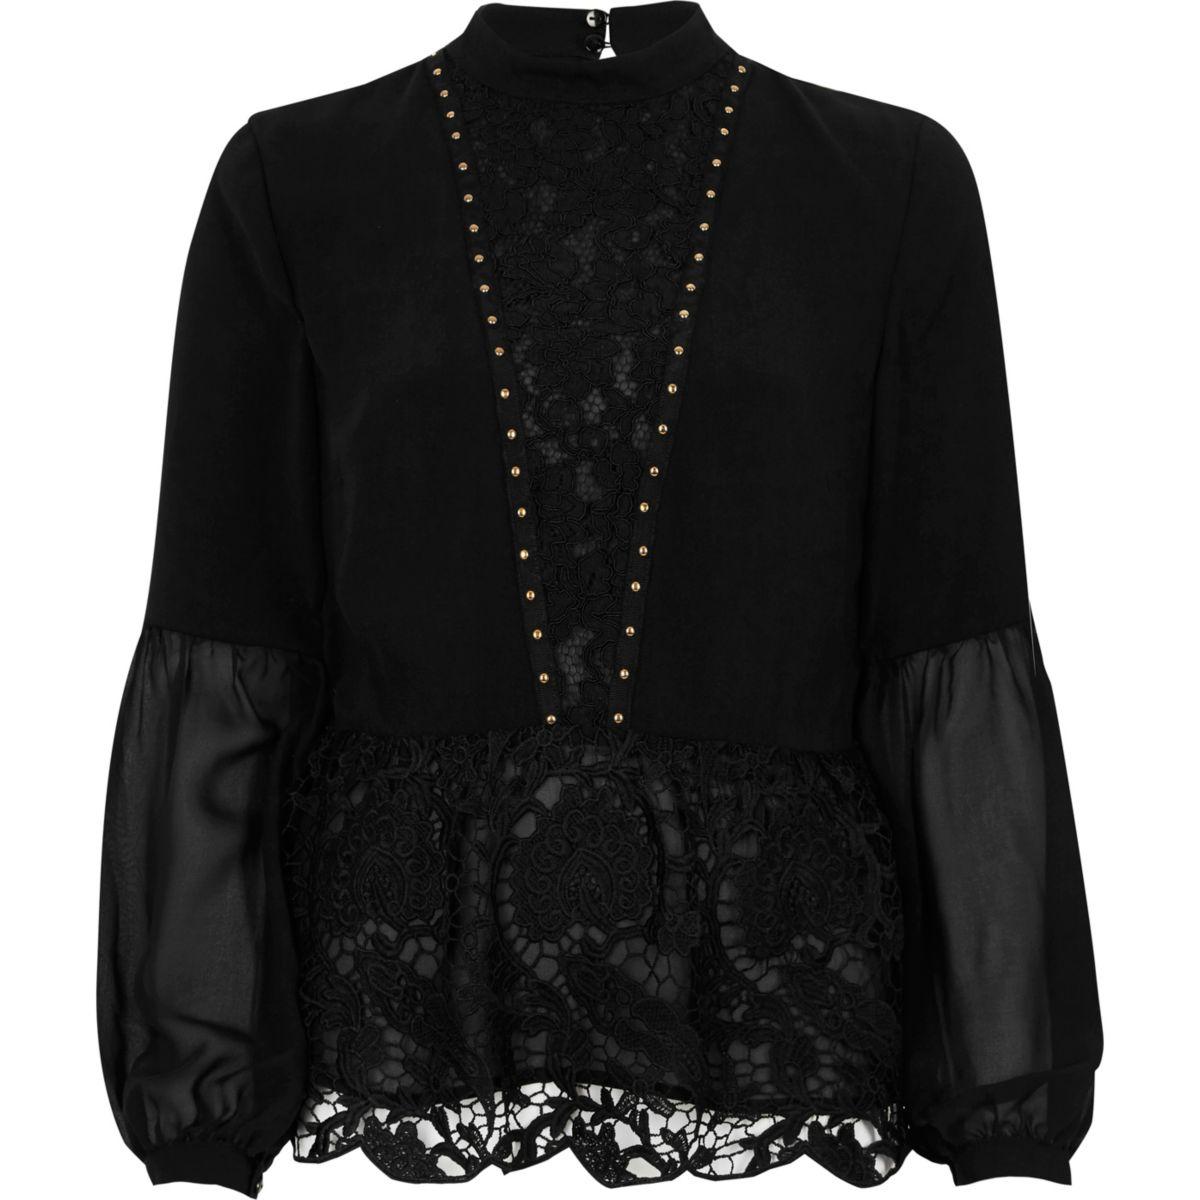 Black lace hem studded long sleeve top